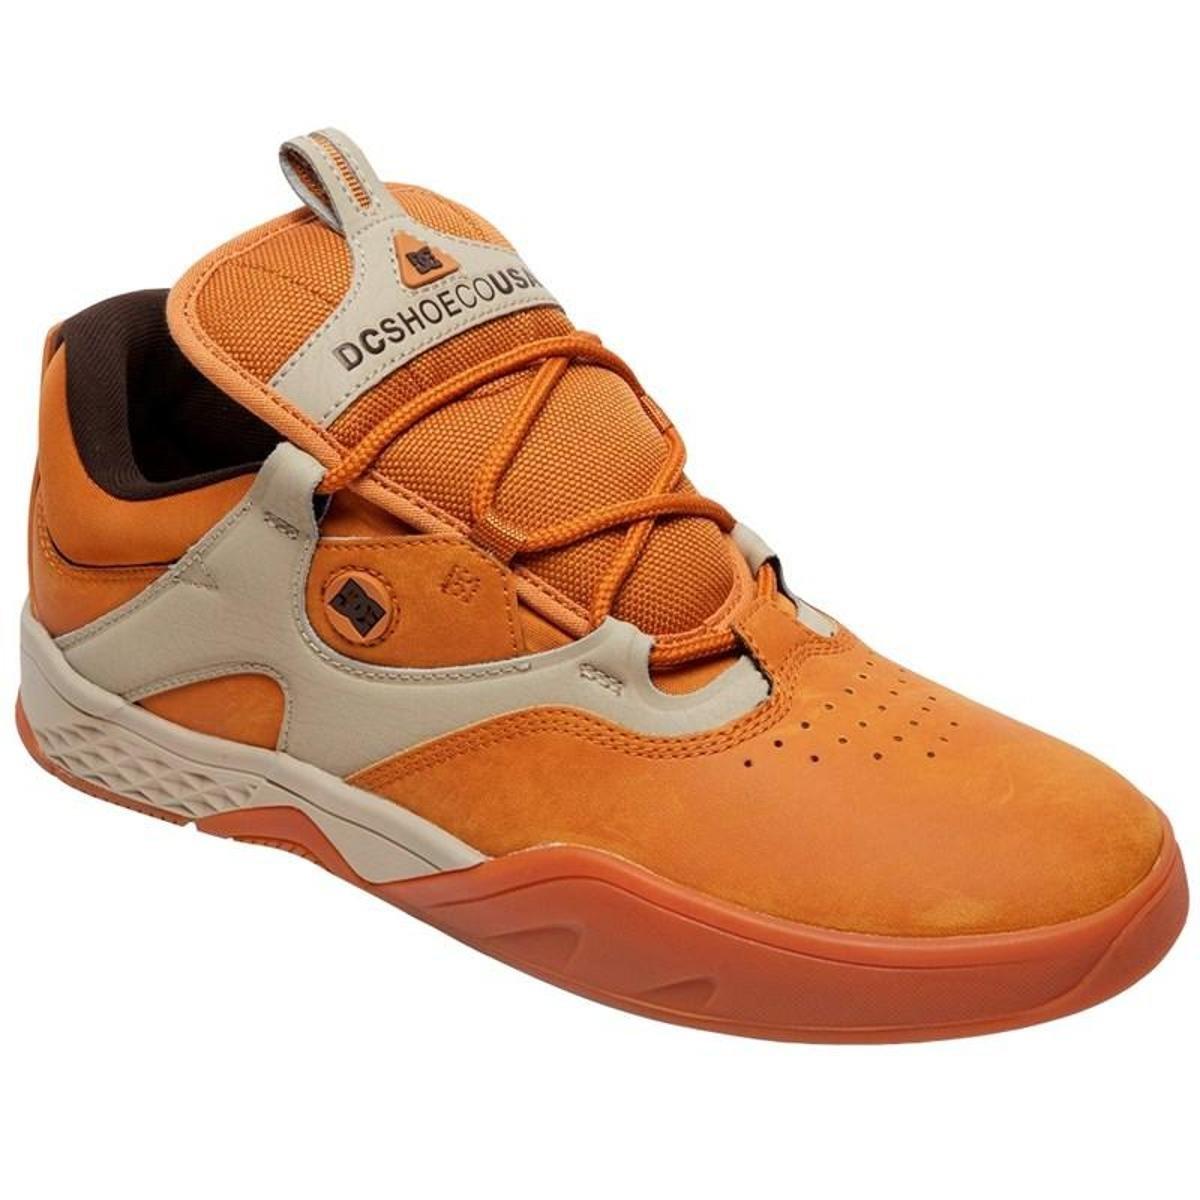 Tenis DC Shoes Kalis S SE - Chocolate